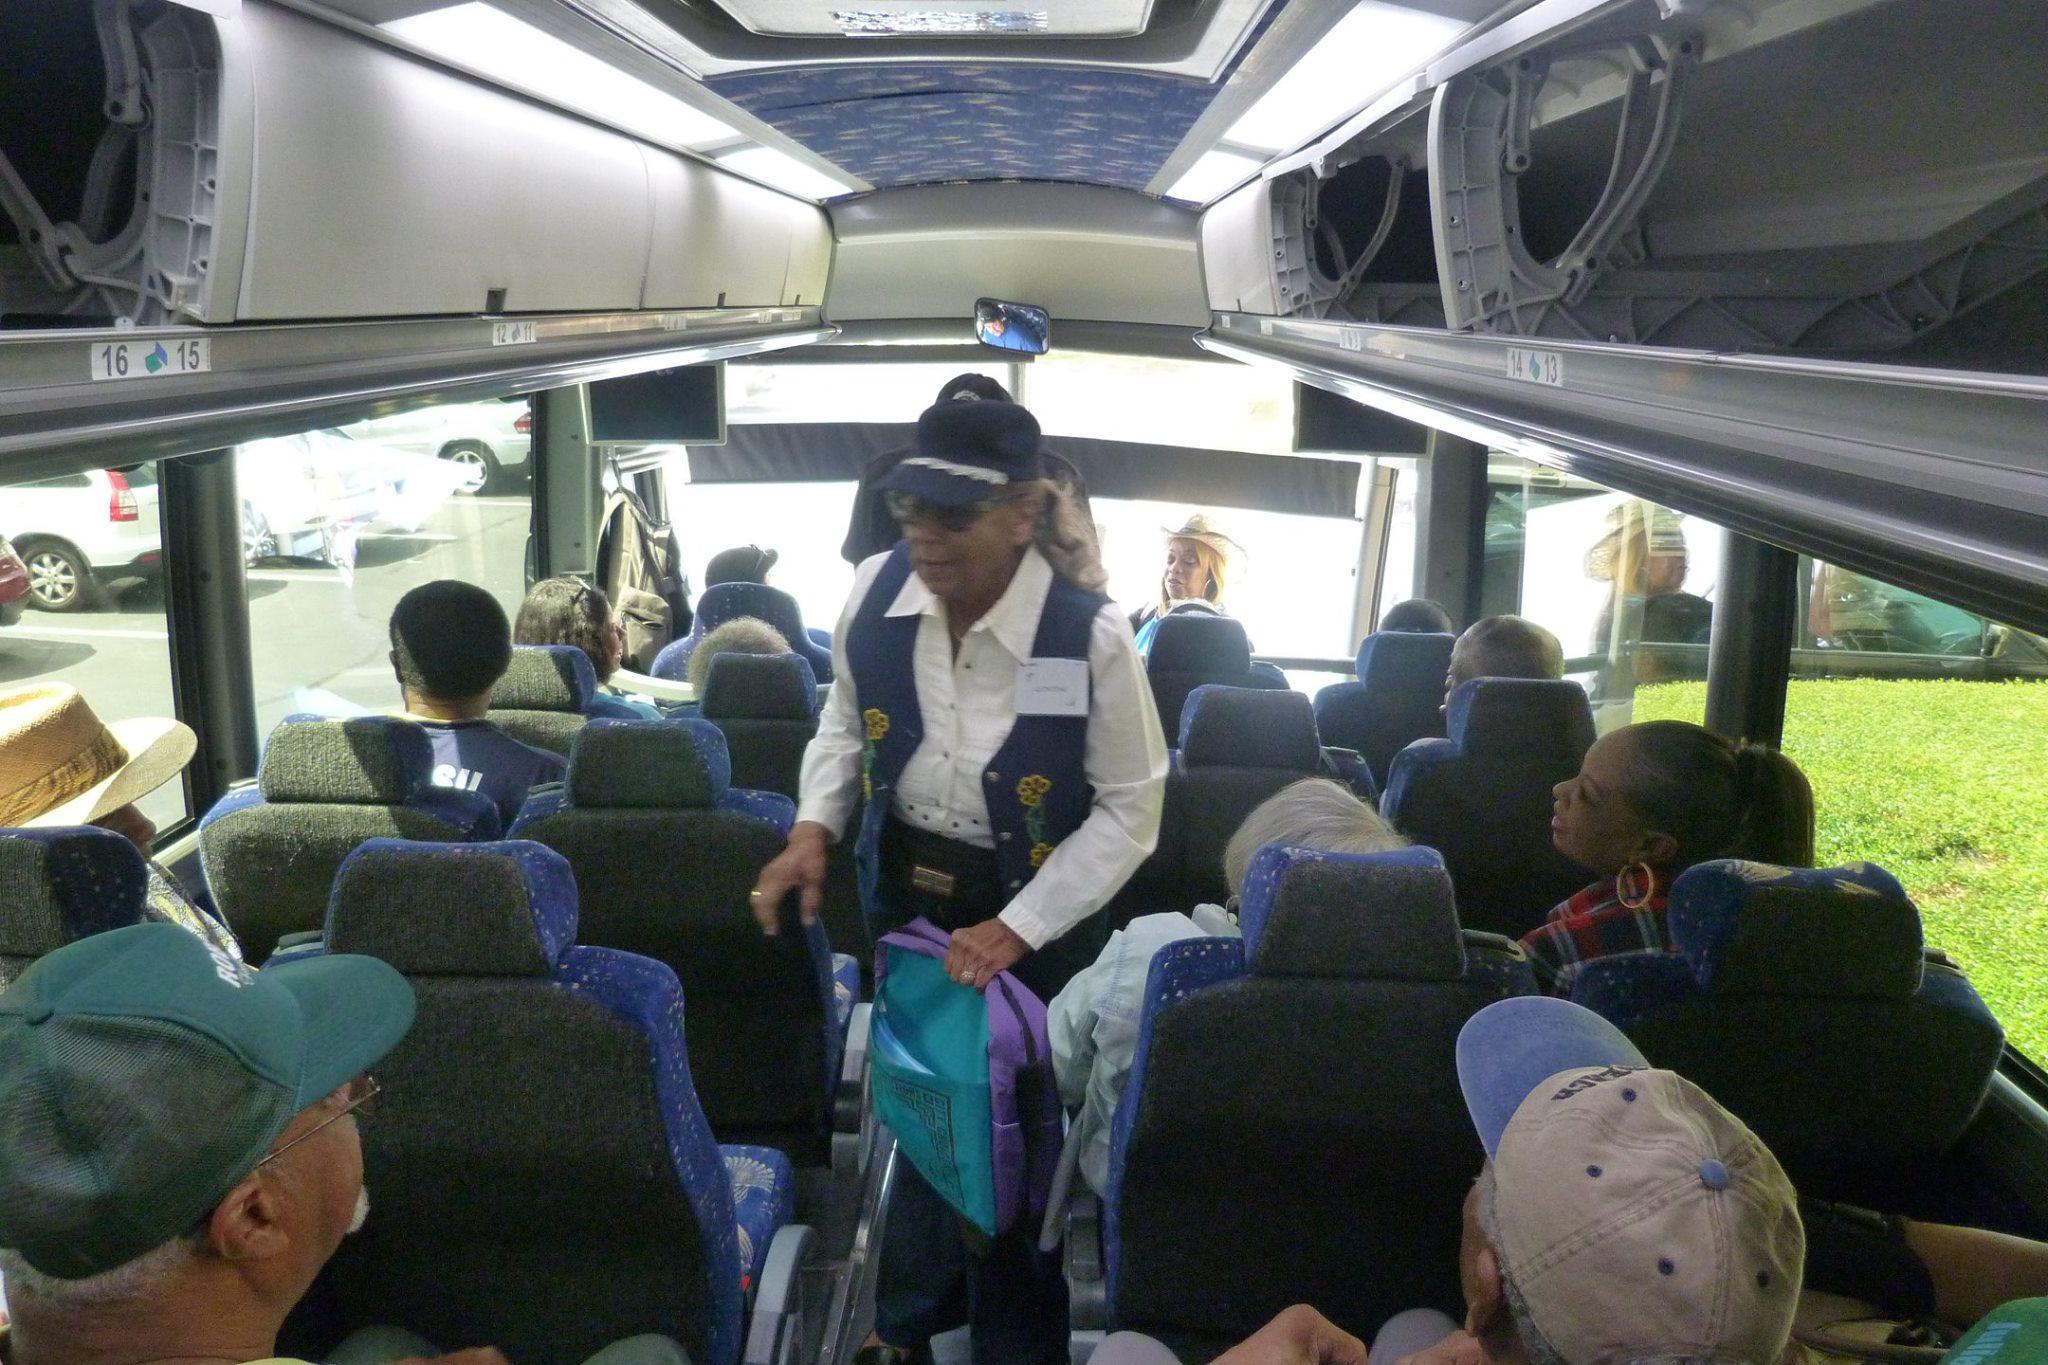 Bus Trip from Austin, Texas to Lincoln, Texas 2017 Reunion